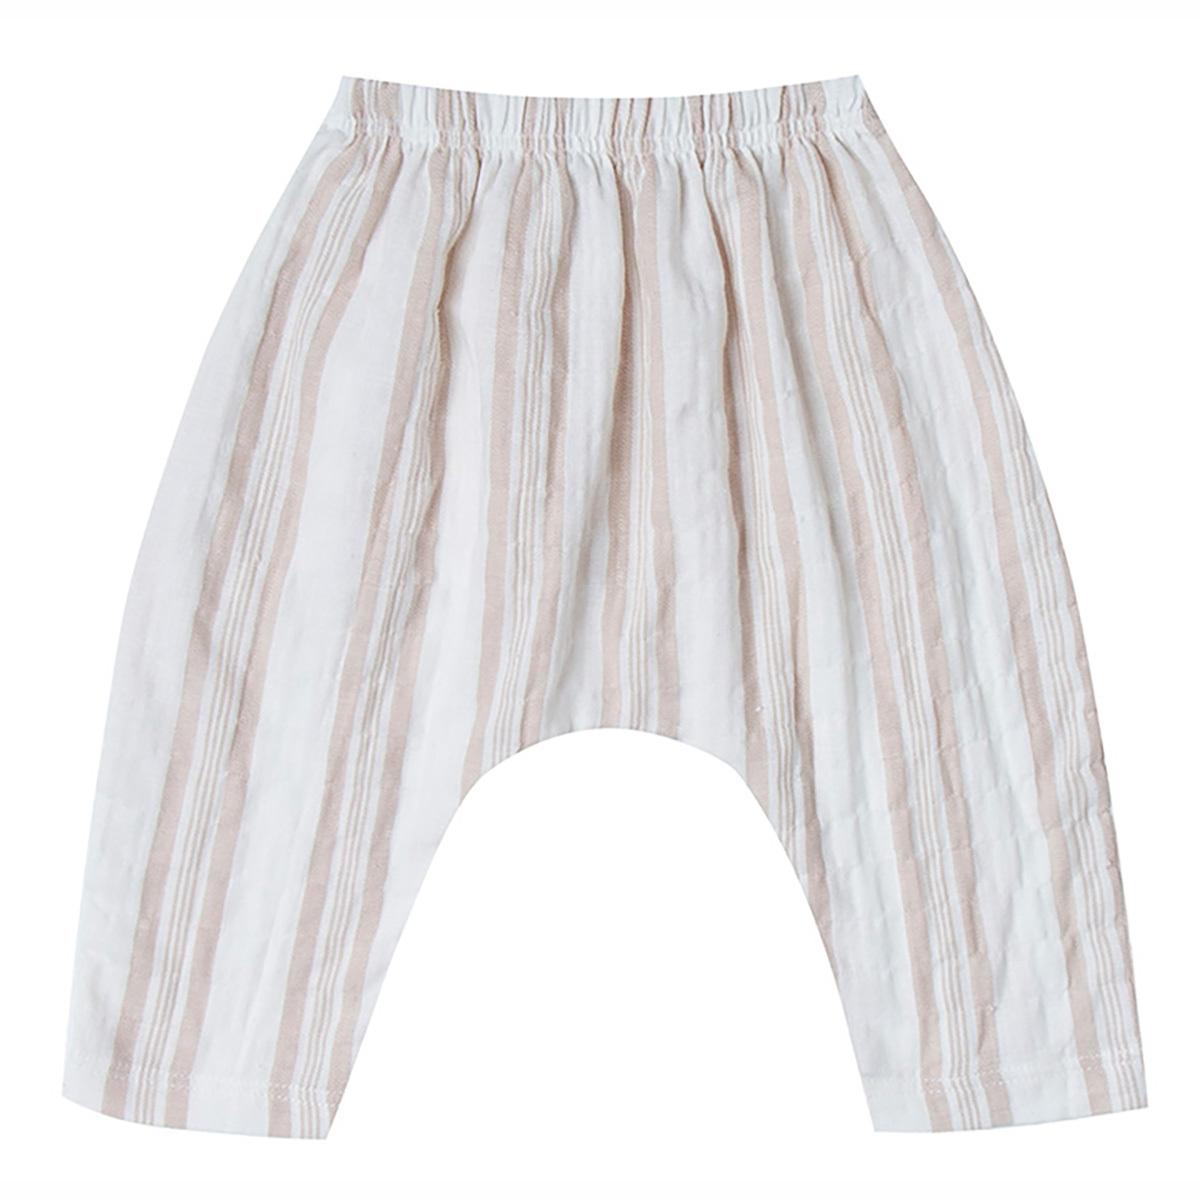 Bas bébé Pantalon à Rayures - Sand - 6/12 Mois